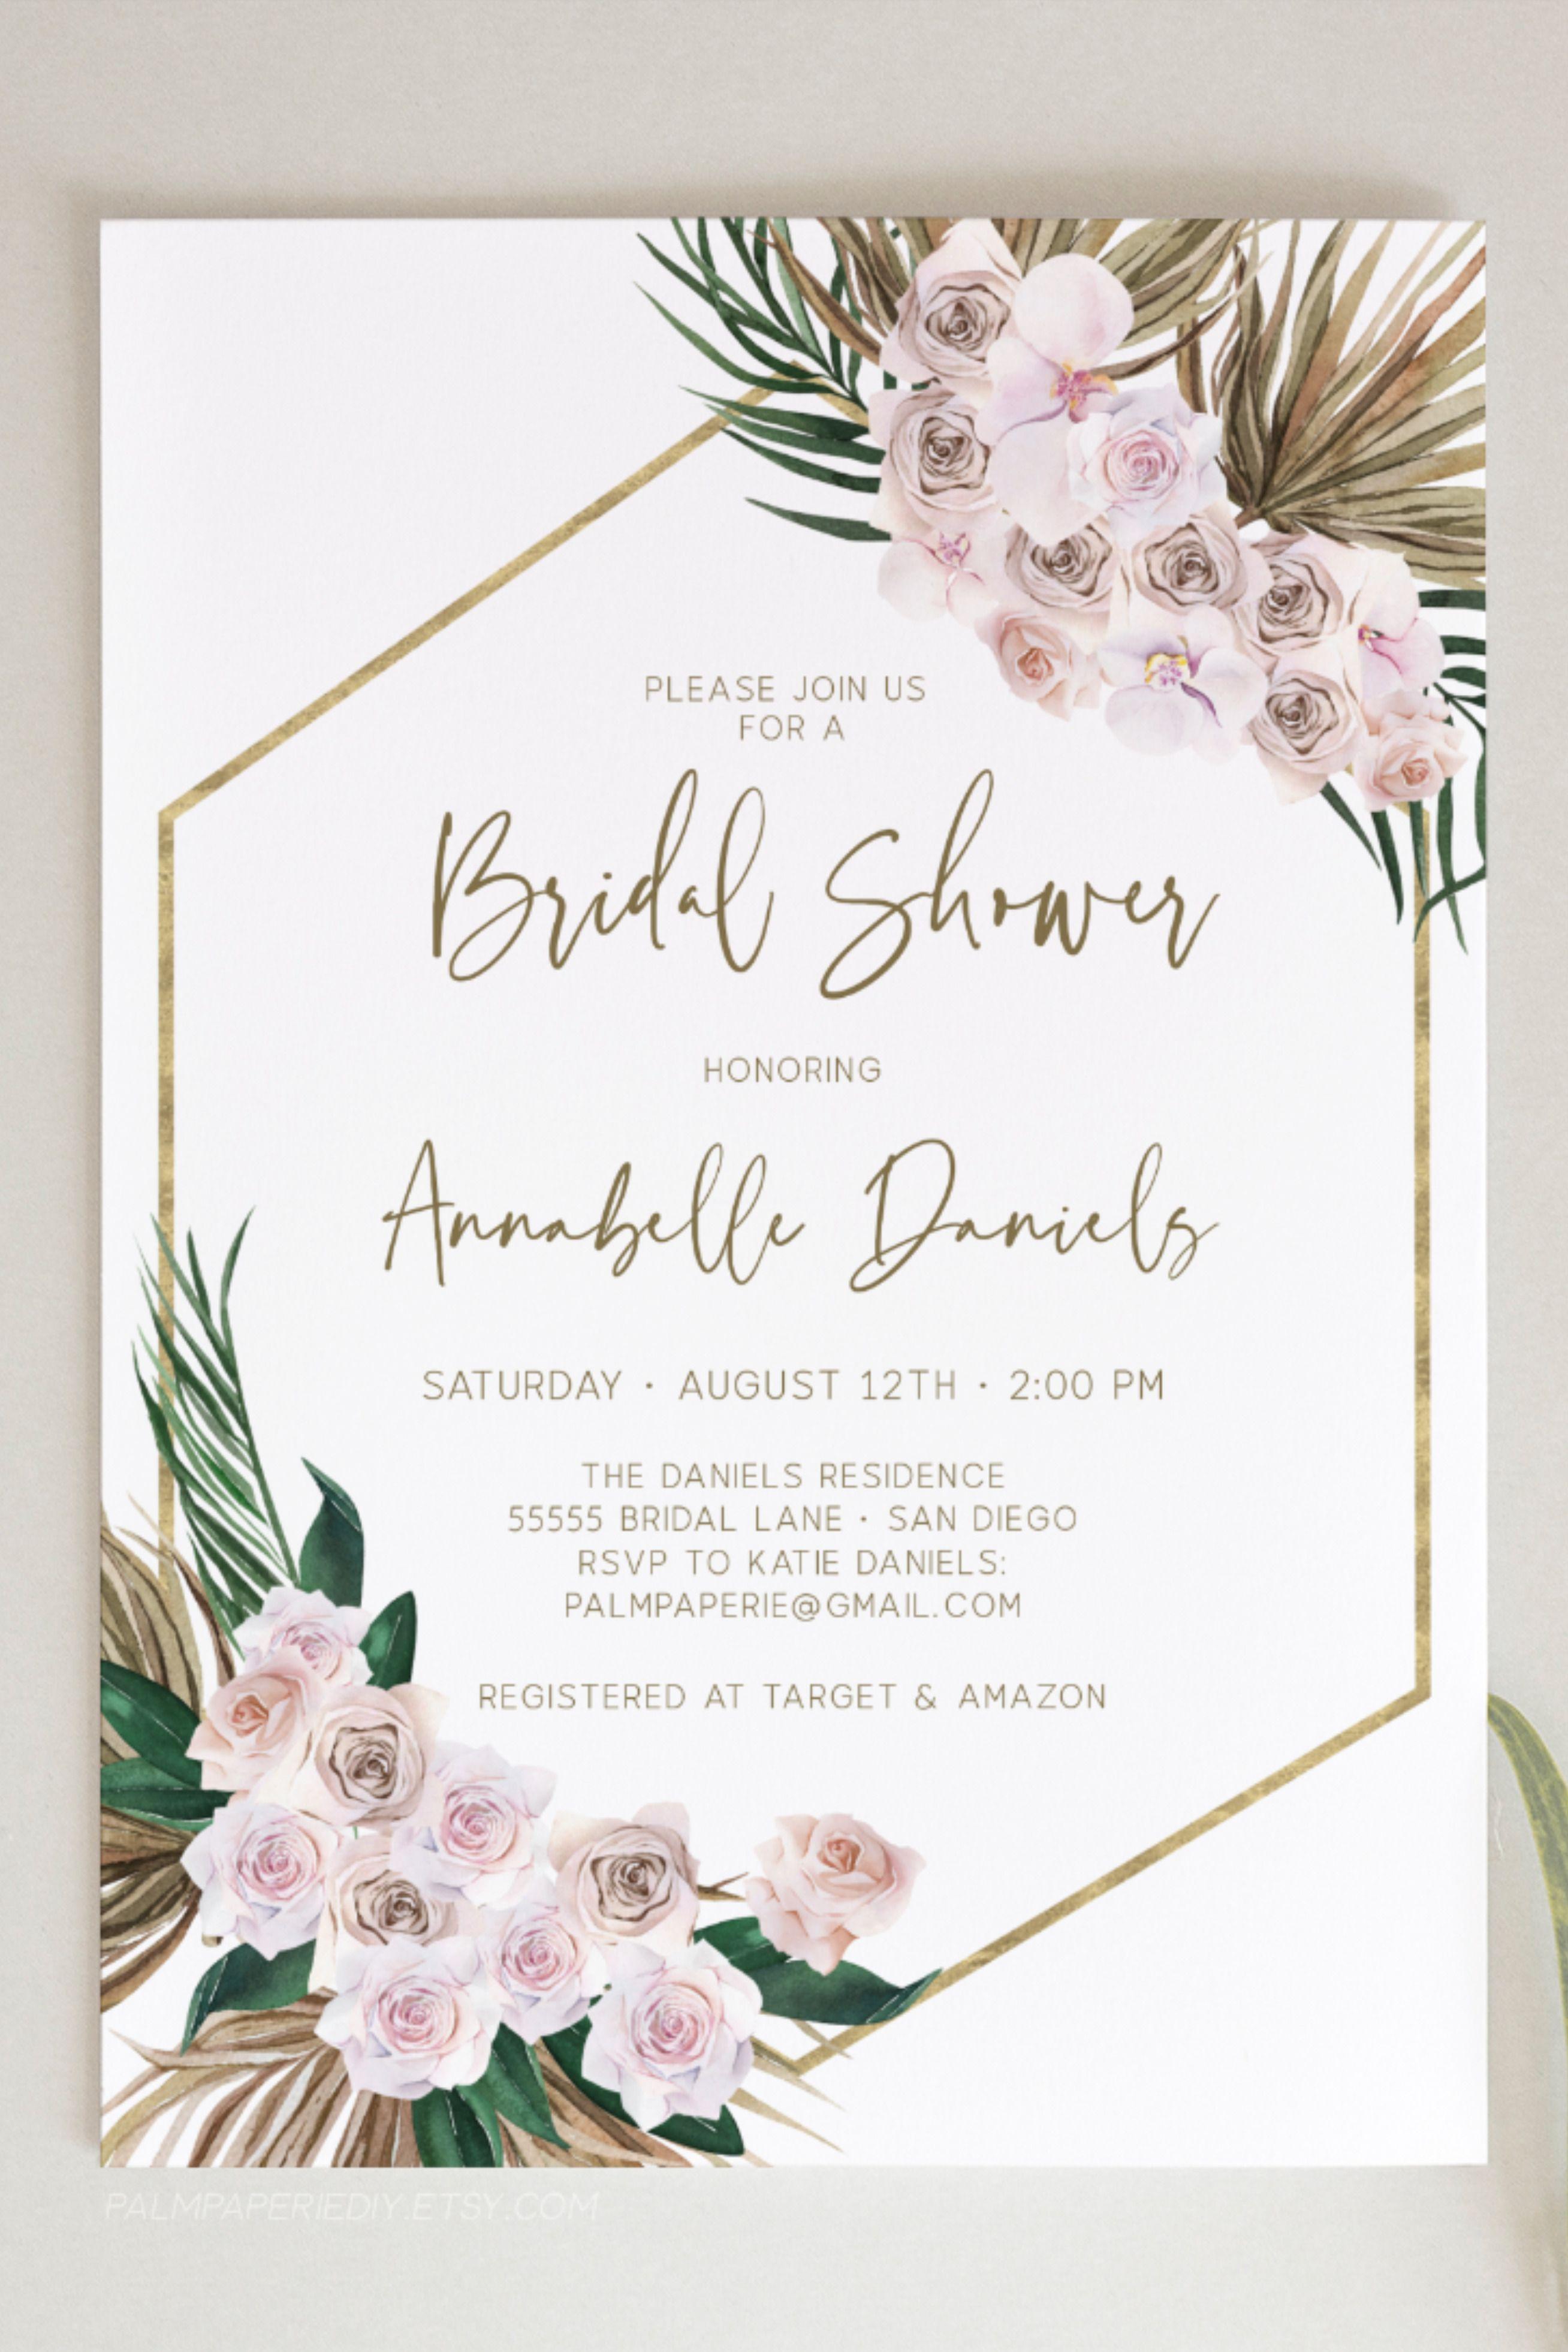 Christmas Bridal Shower Invitation Geometric Bridal Shower Invitation Editable Template Christmas Floral Bridal Shower Invitation